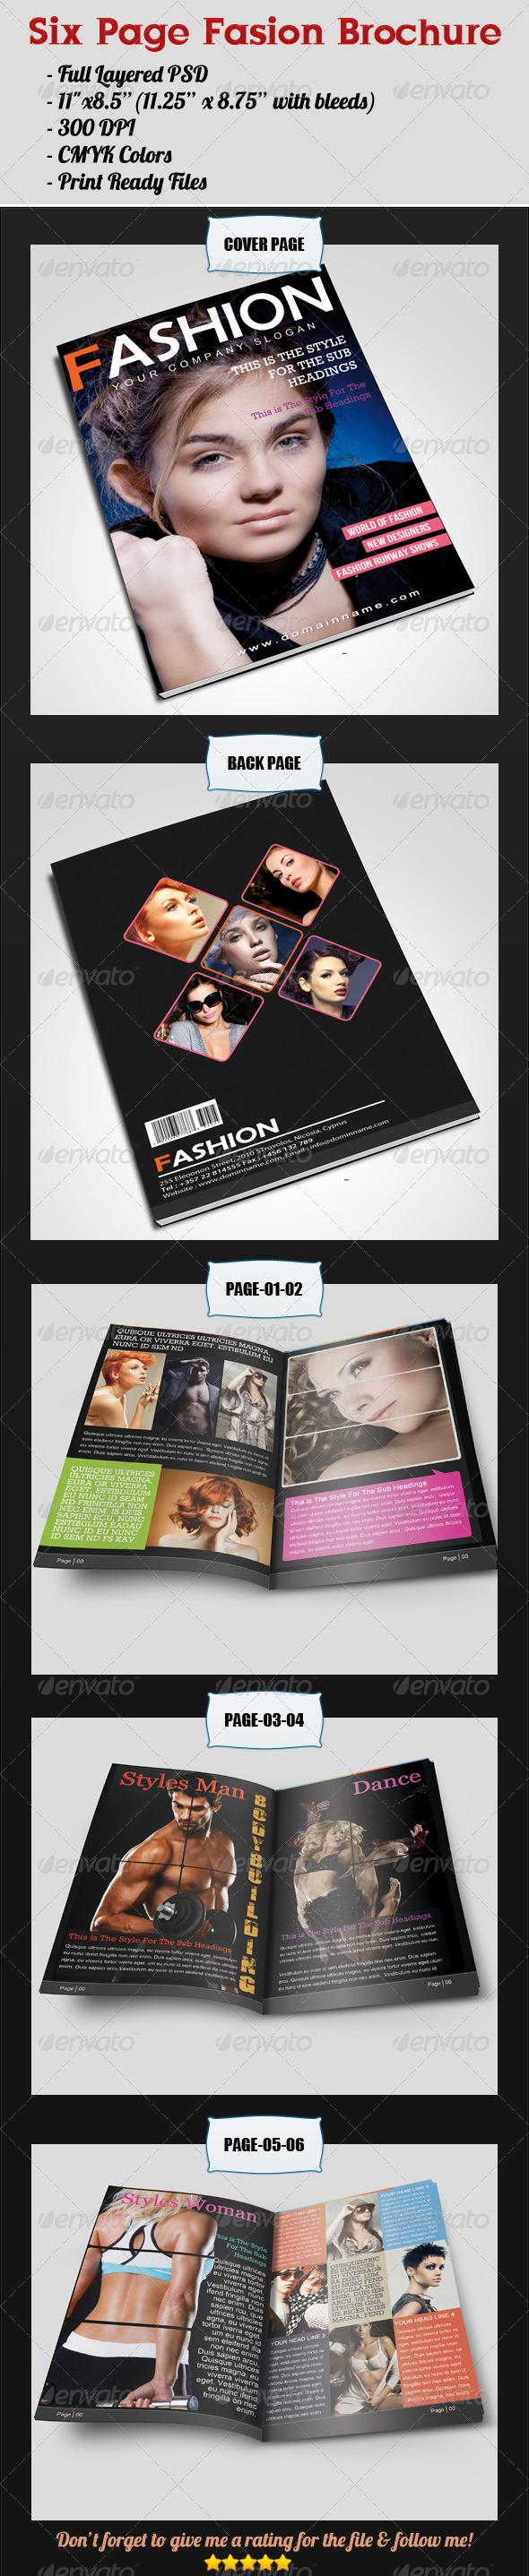 Six Page Fashion Brochure - Brochures Print Templates